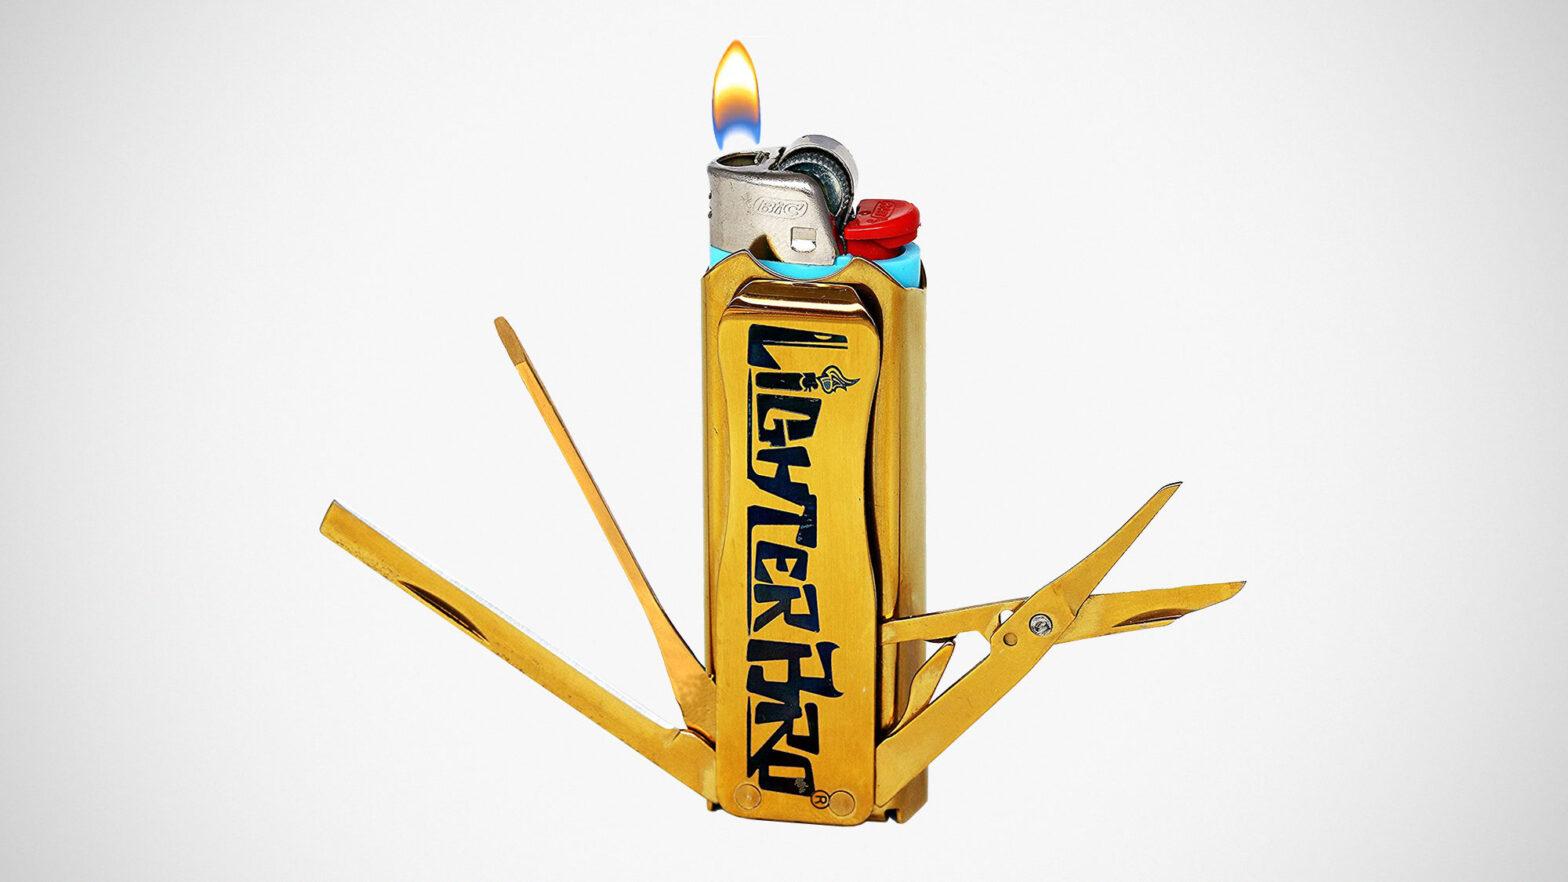 LighterBro Multi-tool For Bic Lighter